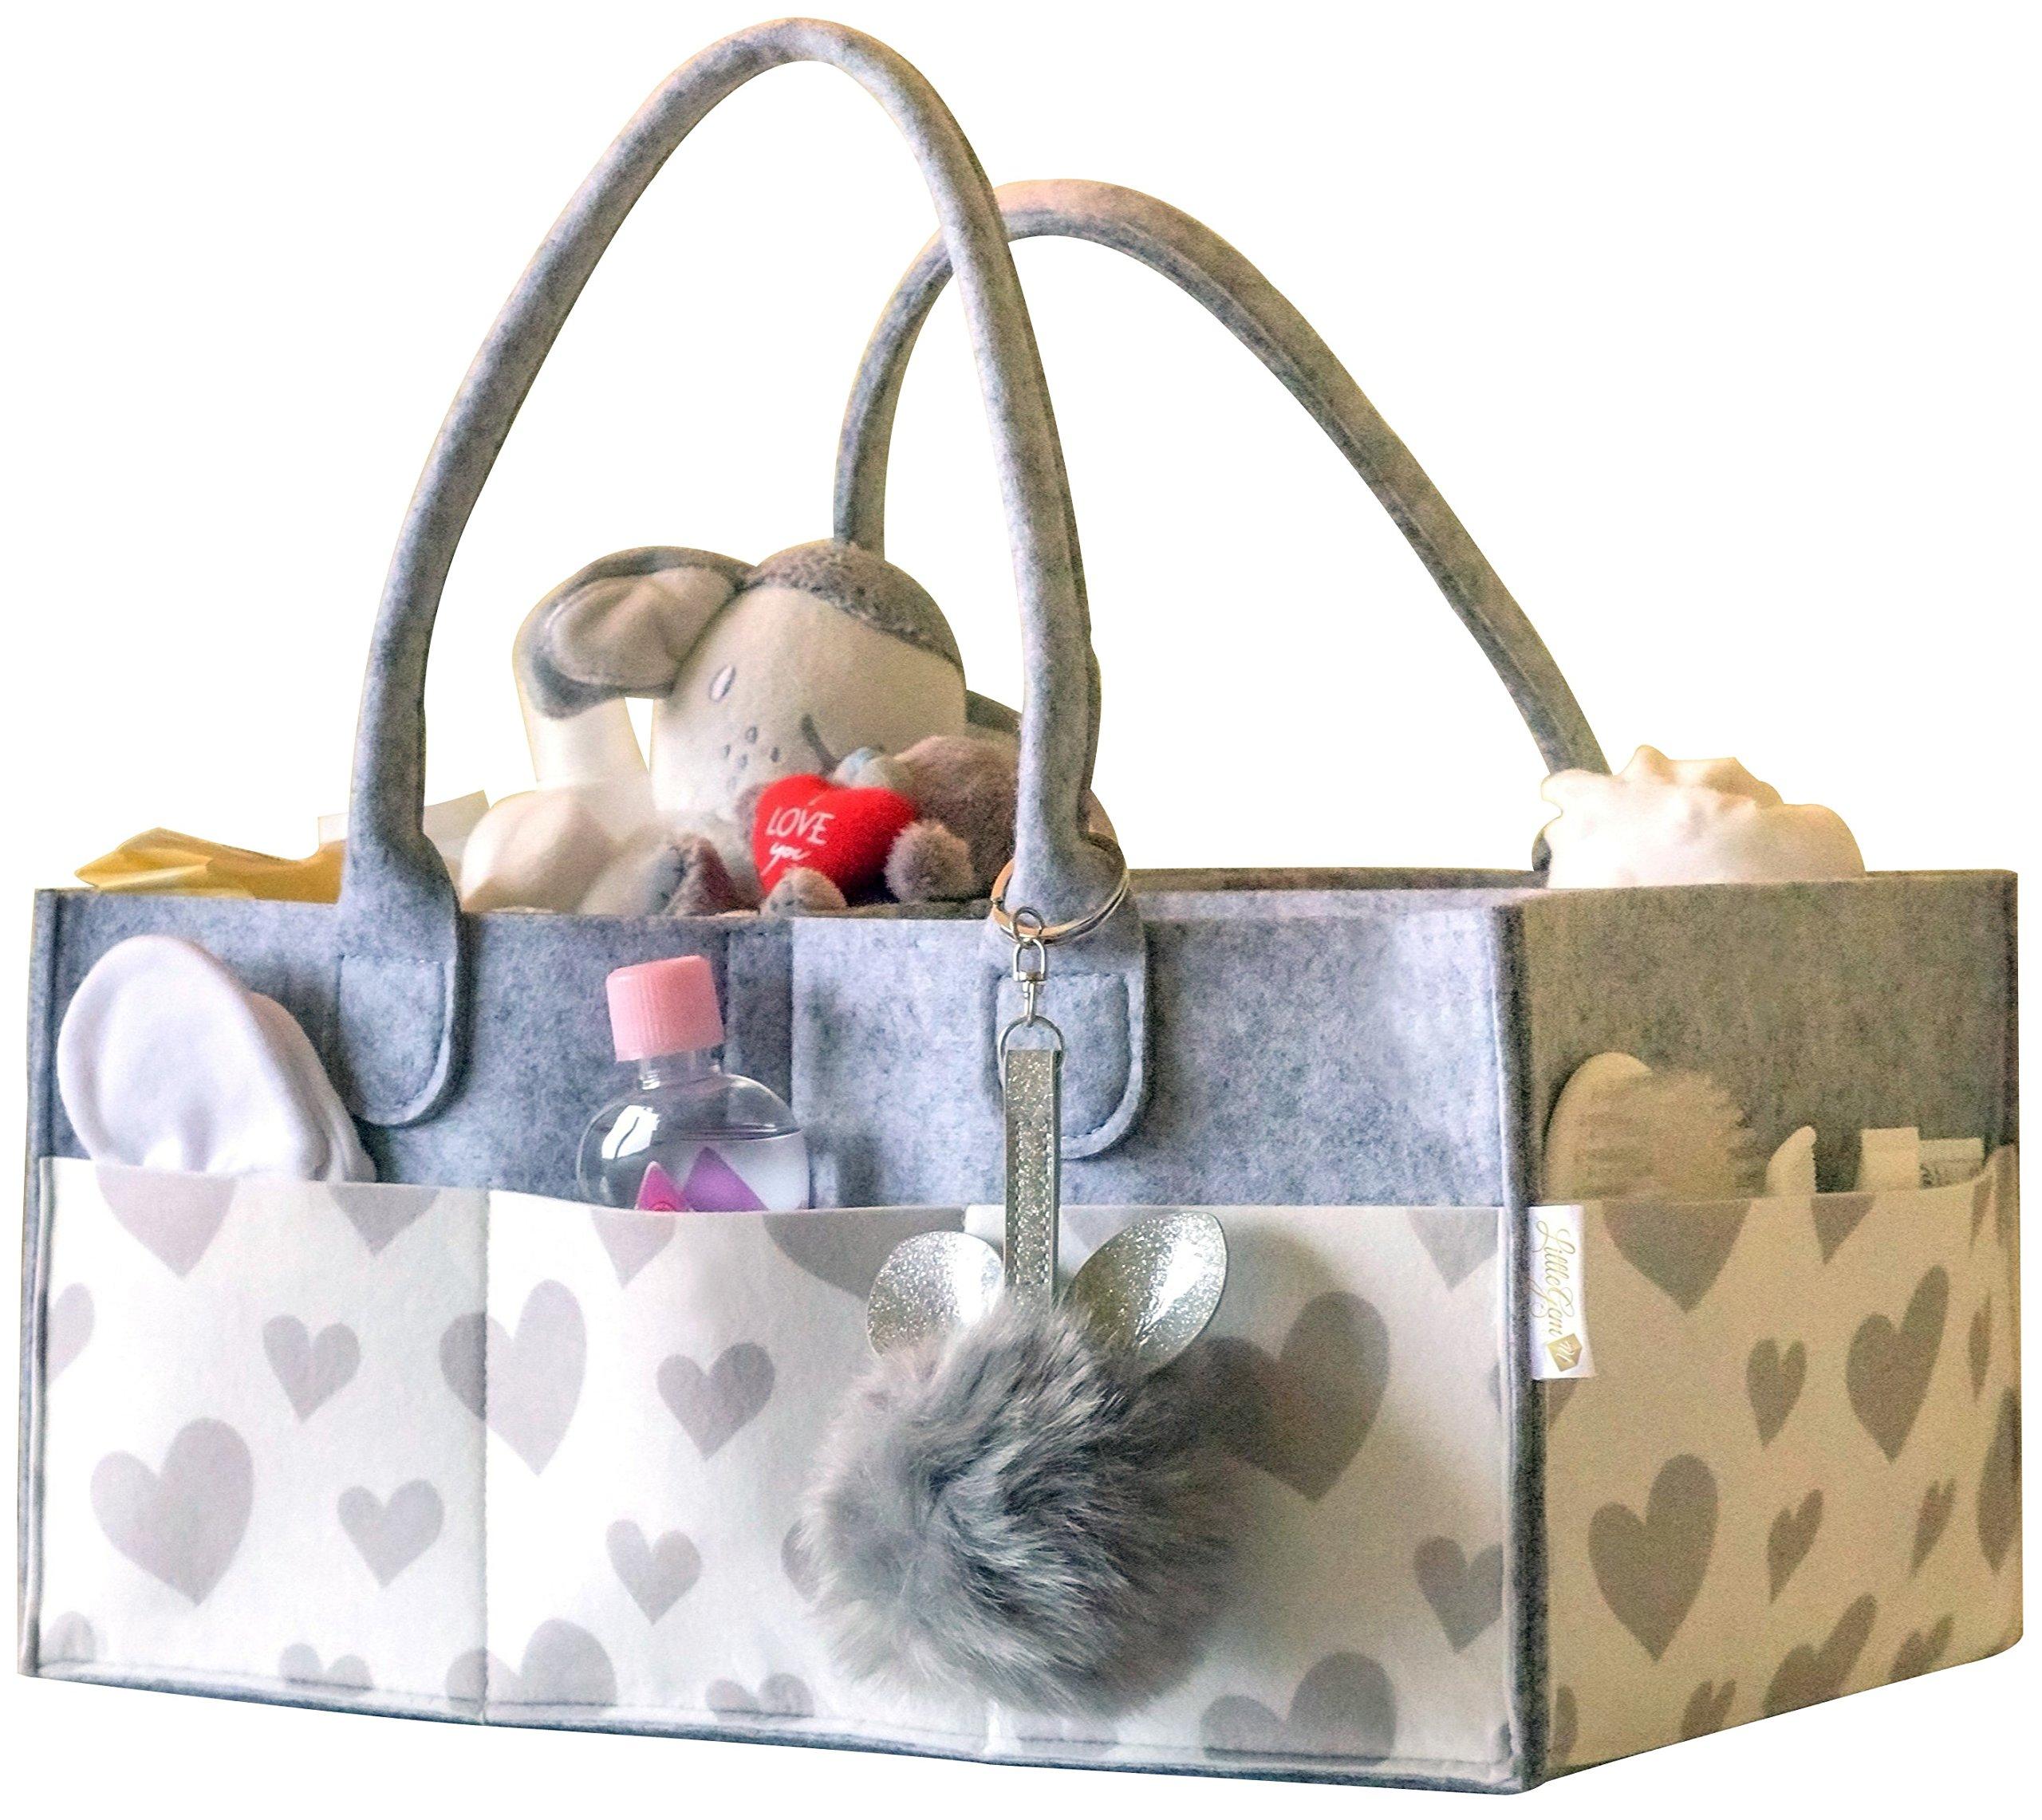 Littlegem4u Baby Diaper Caddy Organizer - Large Diaper Tote Bag   Portable Car Travel Organizer   Nursery Storage Bin   Toy Basket for Boys Girls   Baby Shower Gift   Newborn Registry Must Haves